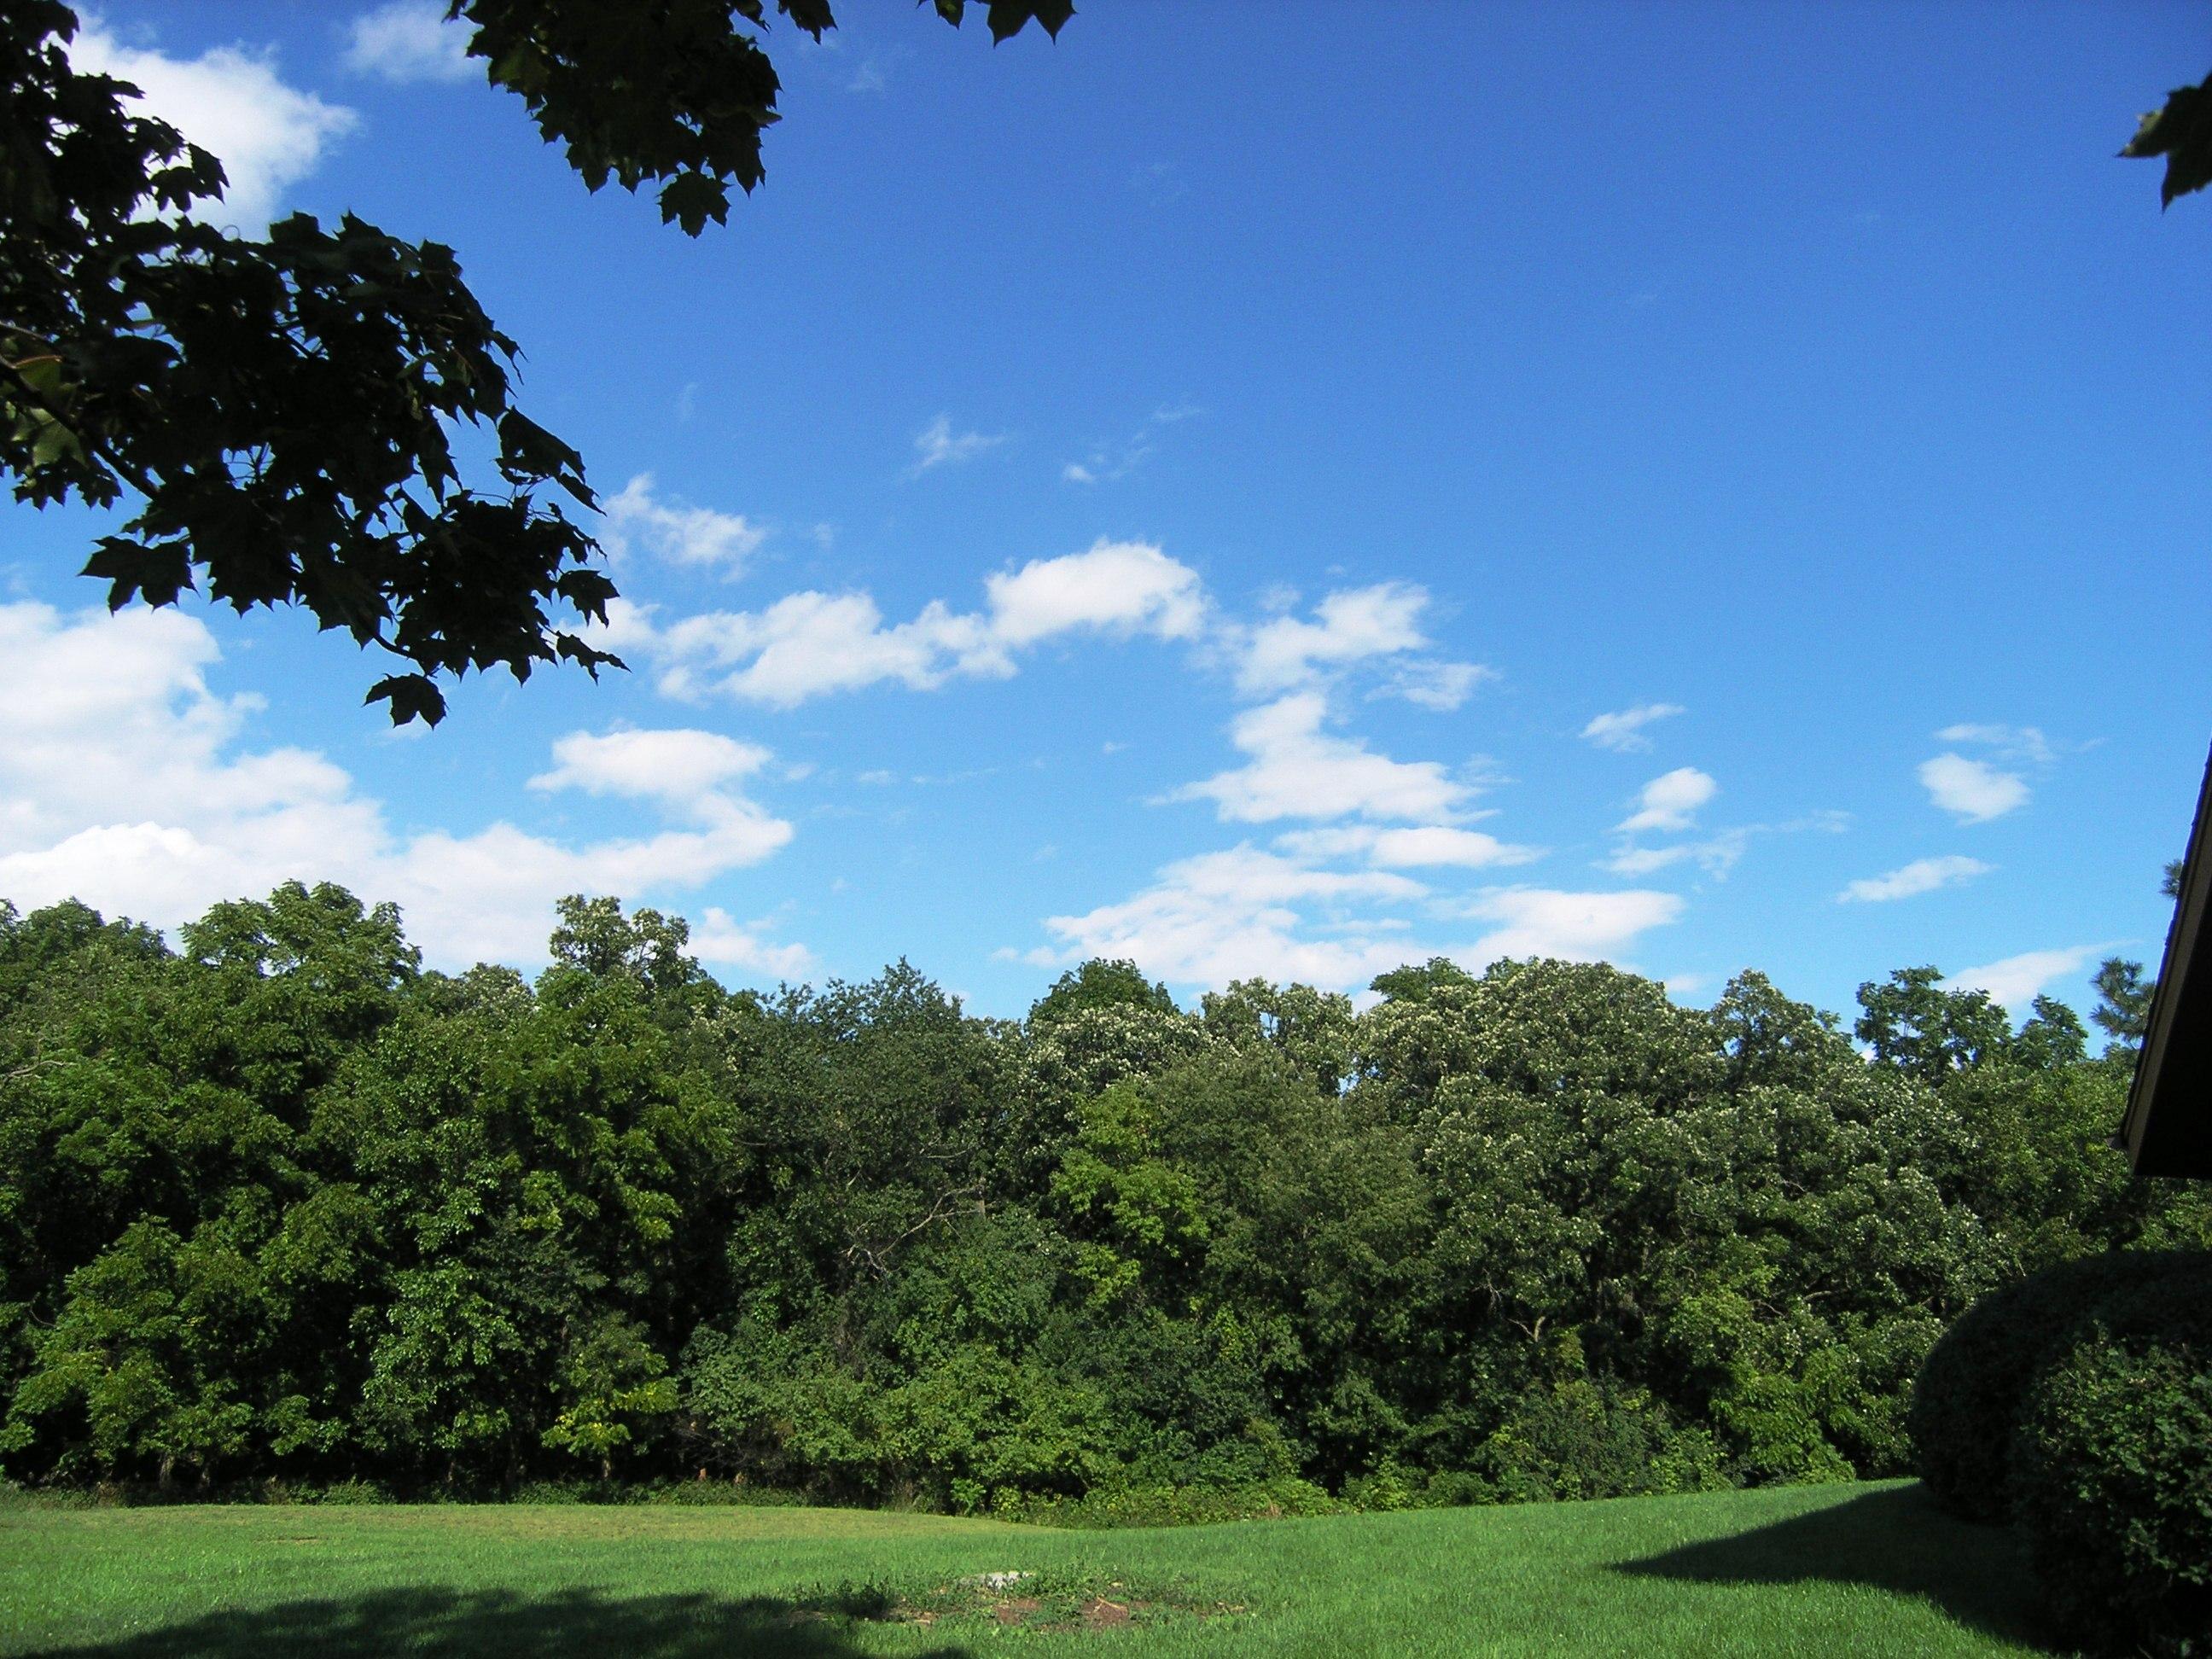 Enjoying a beautiful afternoon at Veteran's Acres Park